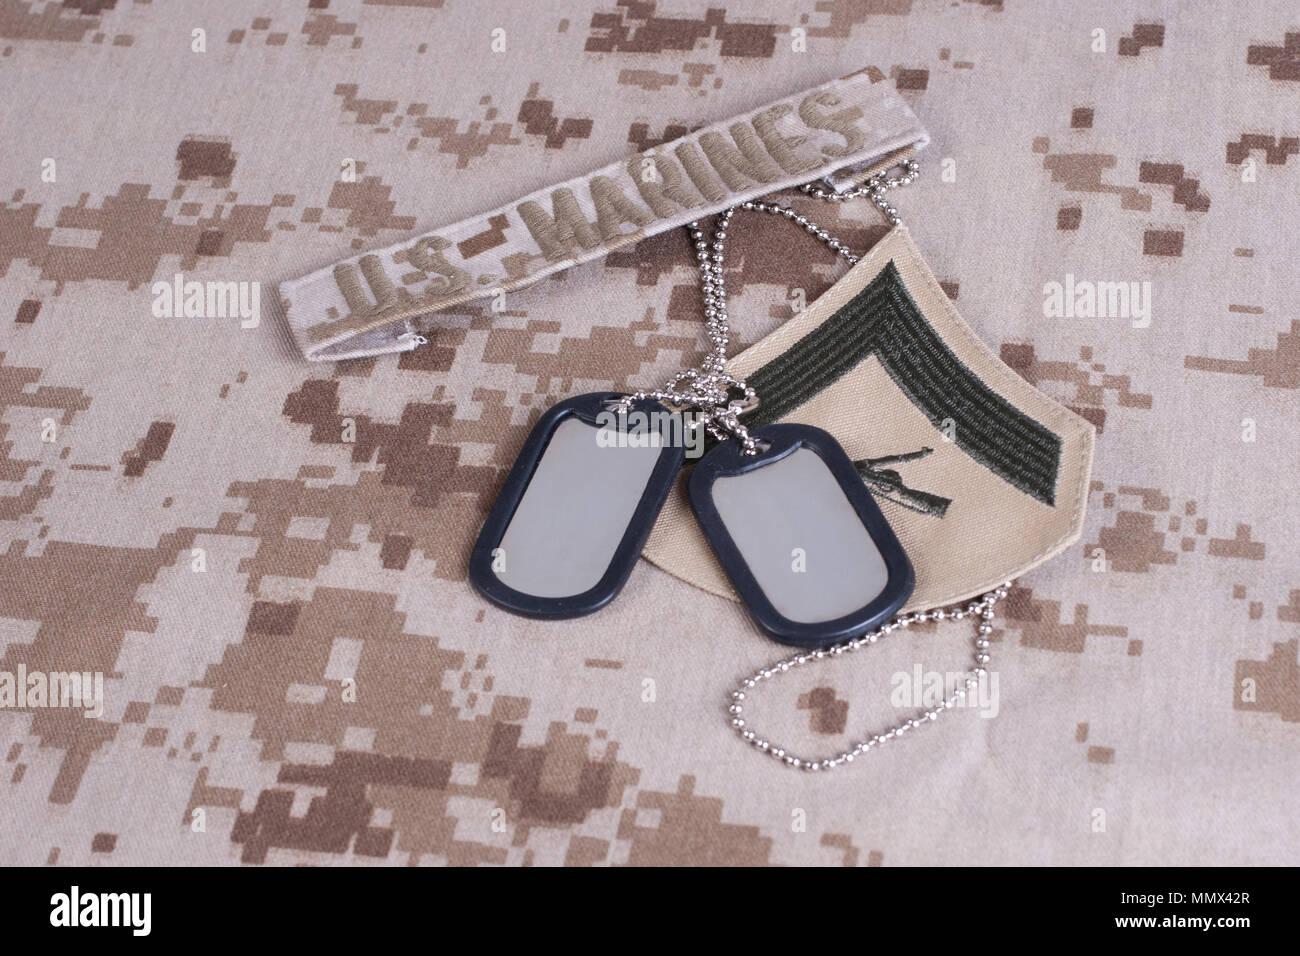 us marines camouflaged uniform with blank dog tags Stock Photo